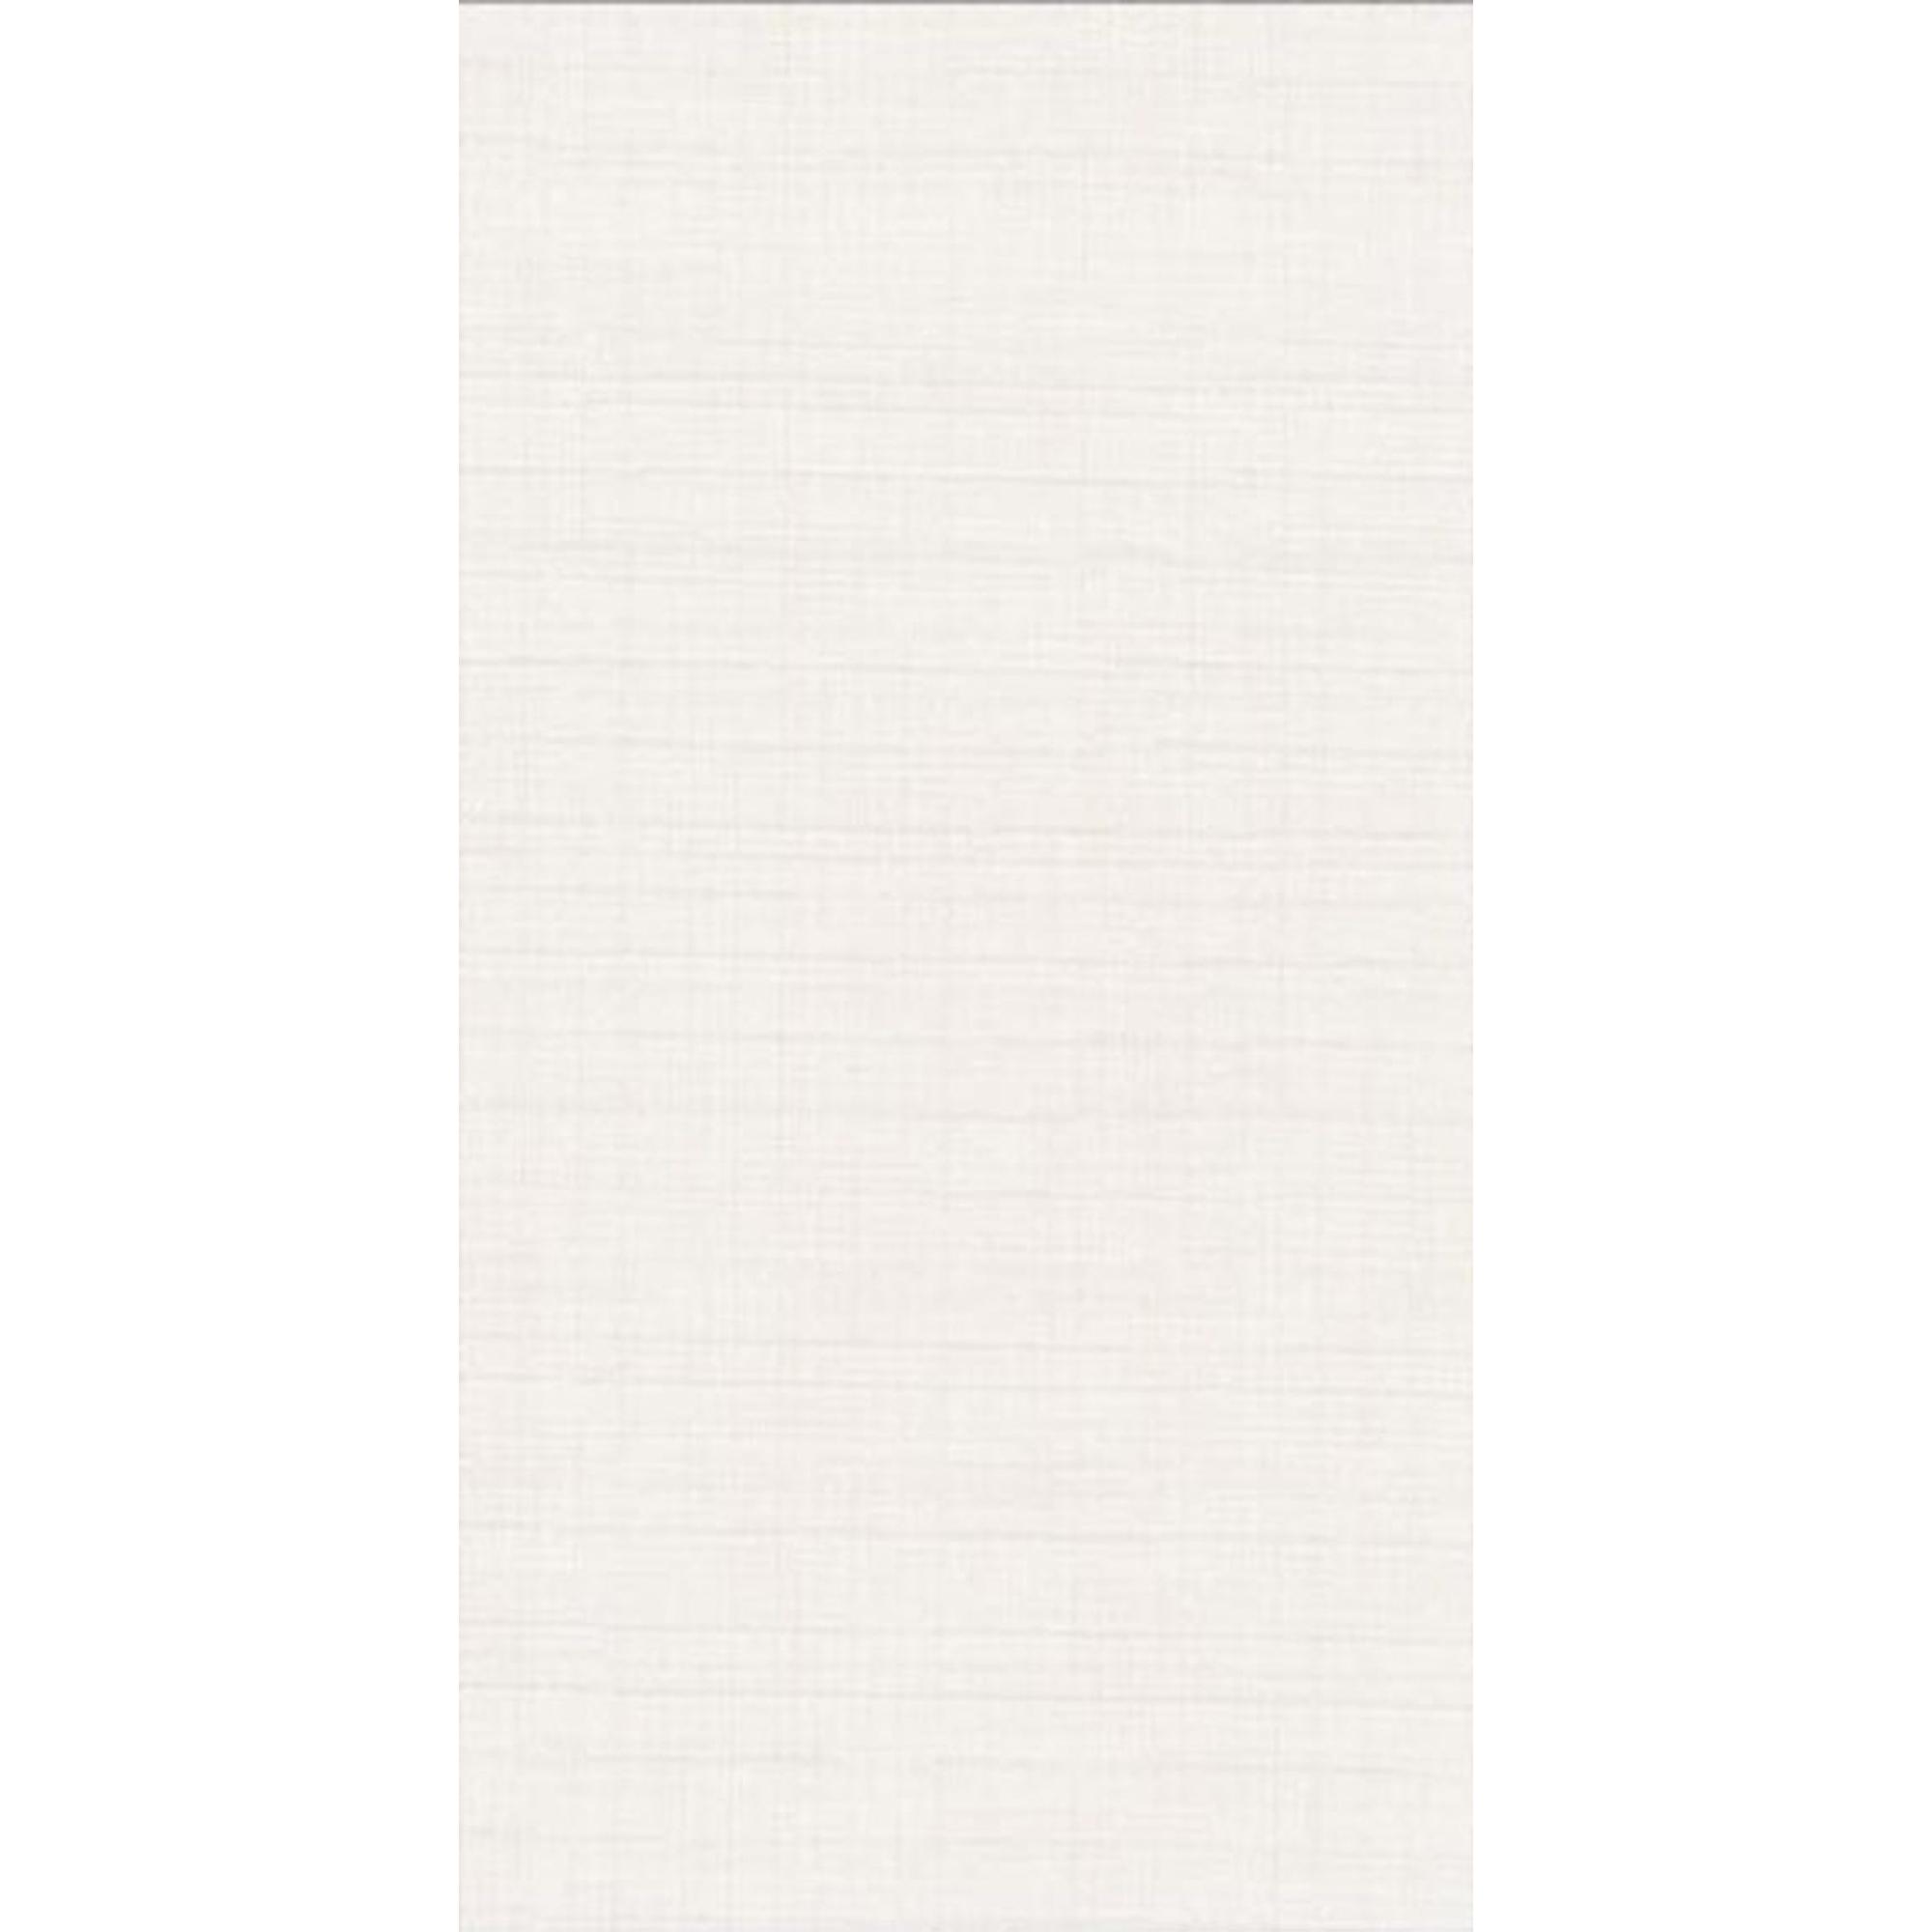 Плитка Tau Ceramica Campagne Marron 31,6x60 см недорого